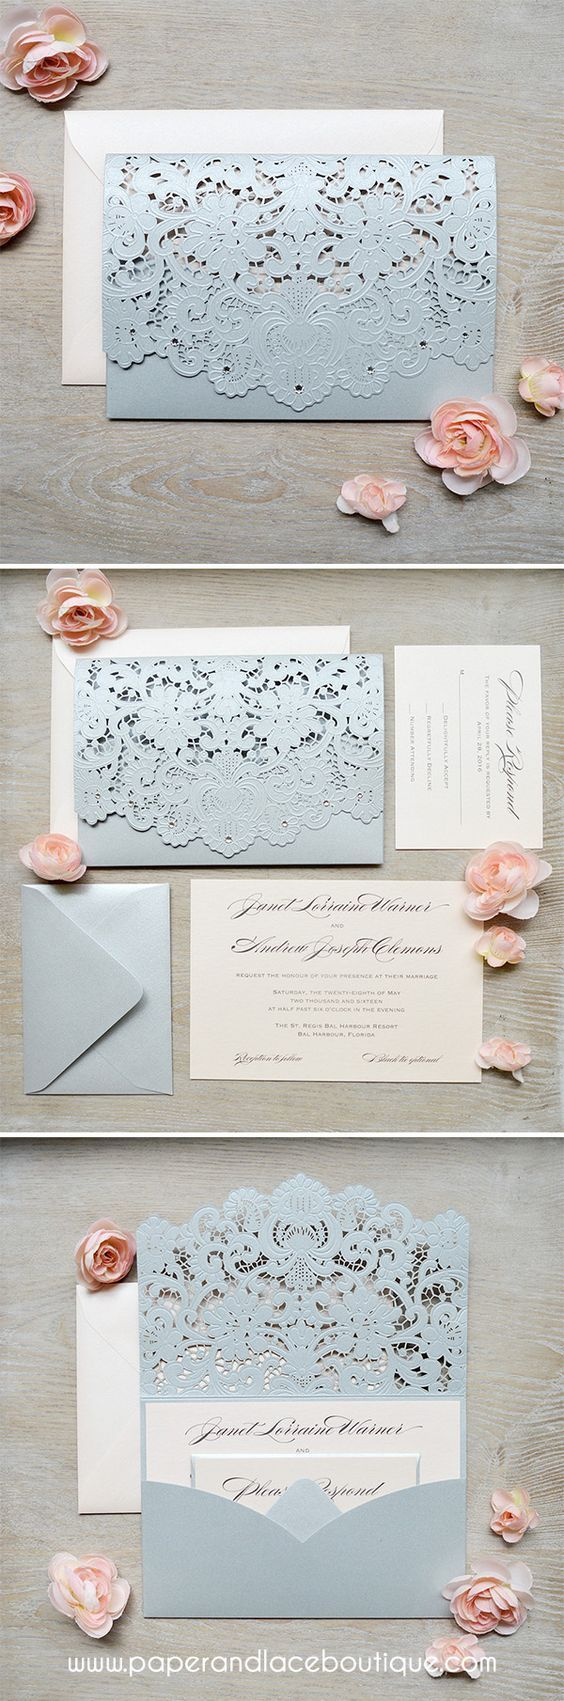 Silver and Blush Laser Cut Wedding Invitations   Wedding   Pinterest ...